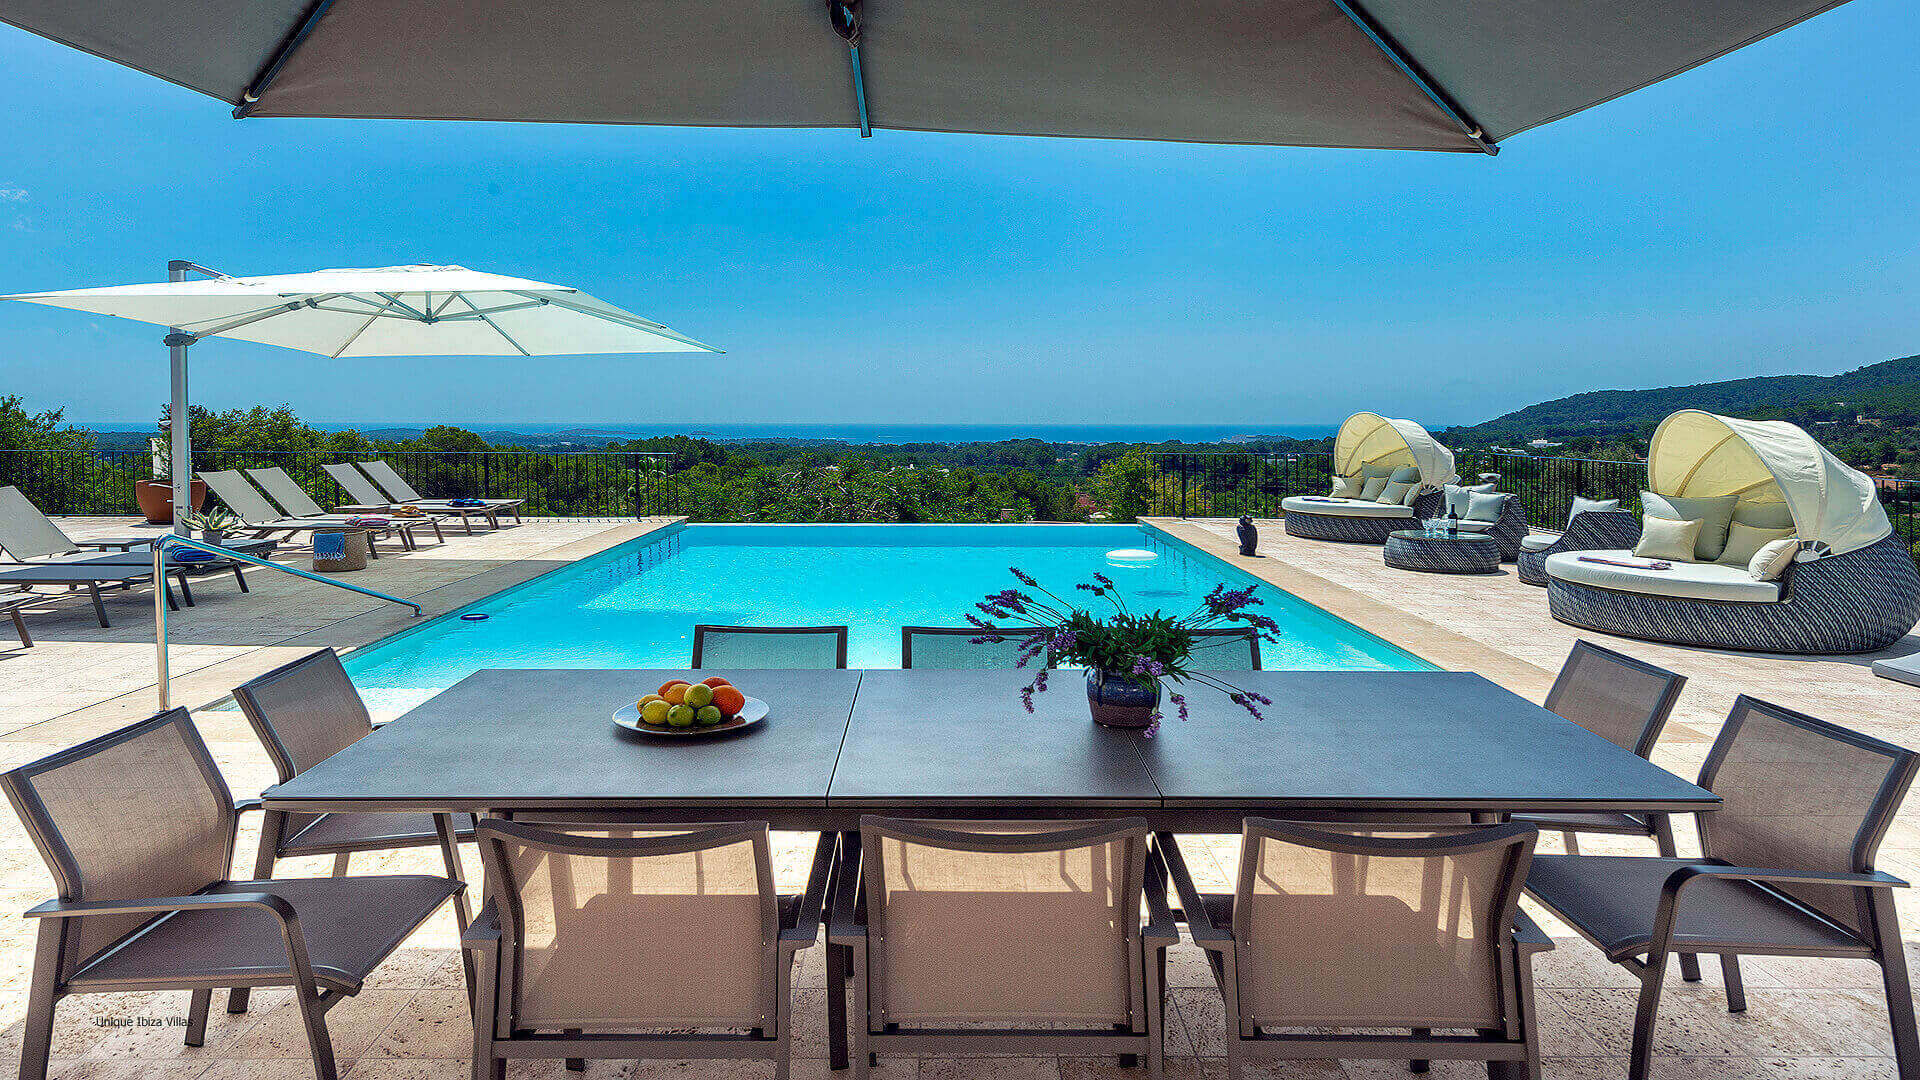 Casa Prats Ibiza 6 Santa Eulalia